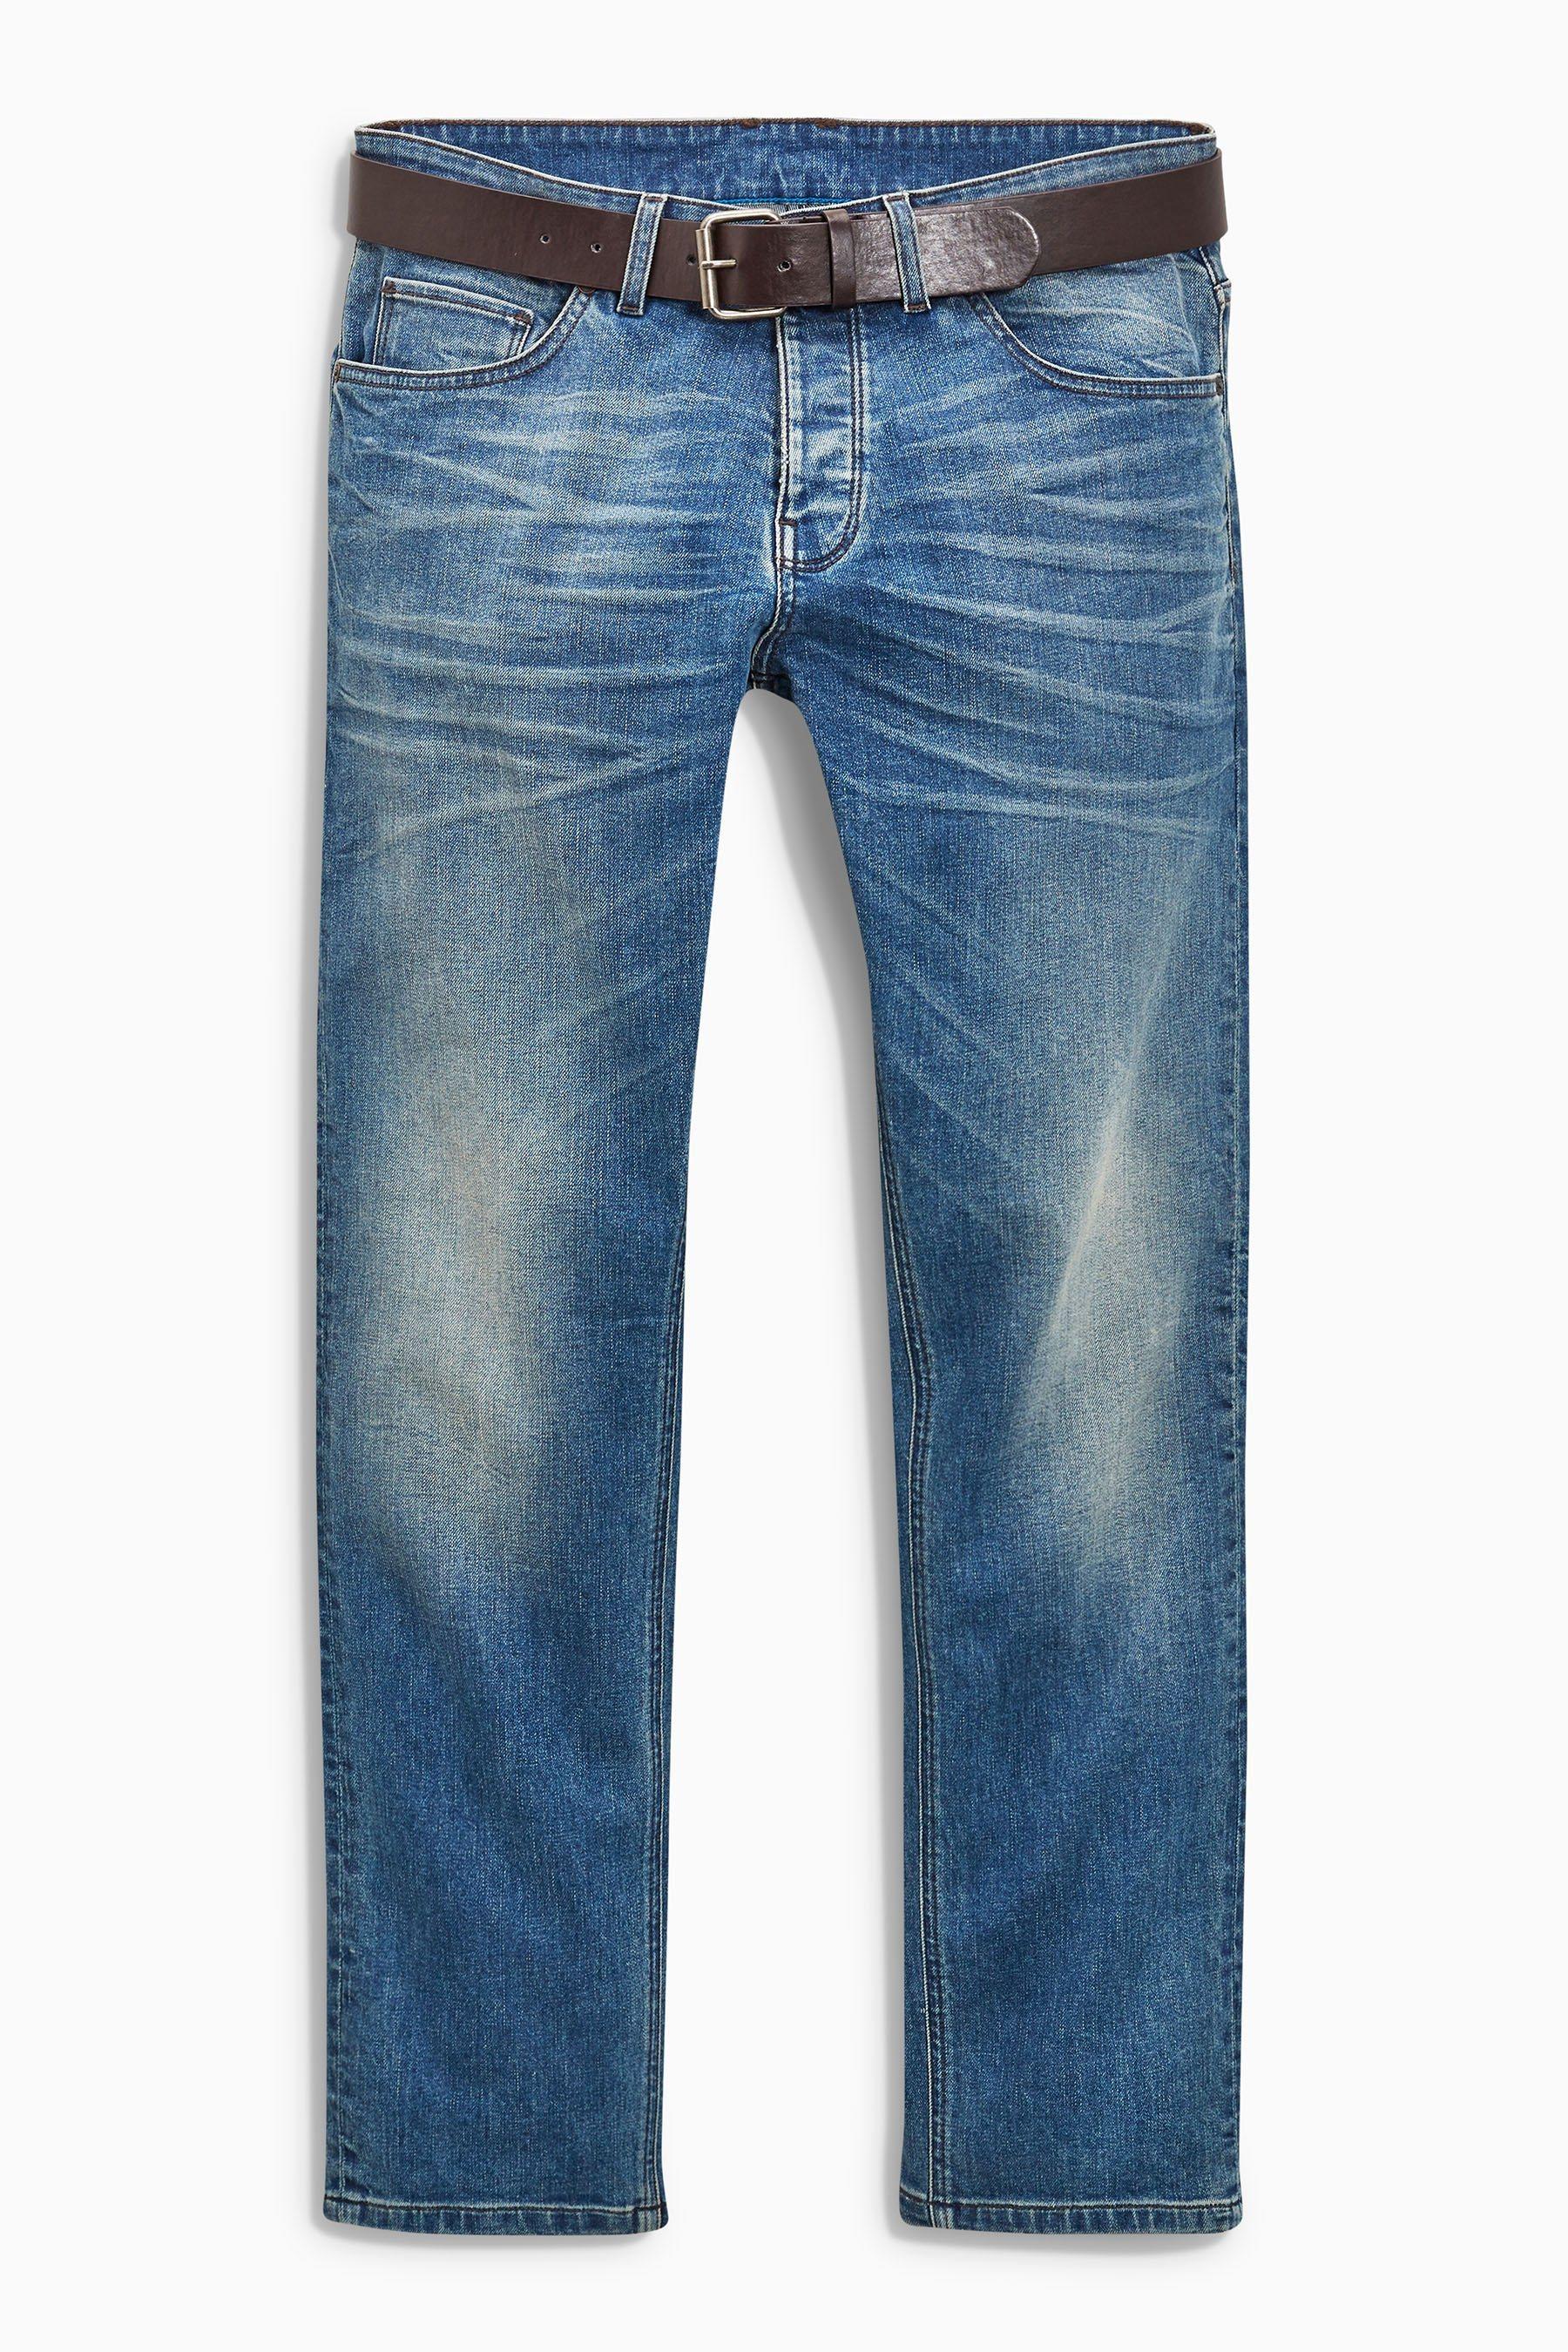 Next Slim-Fit Light Blue Stretch-Jeans mit Gürtel